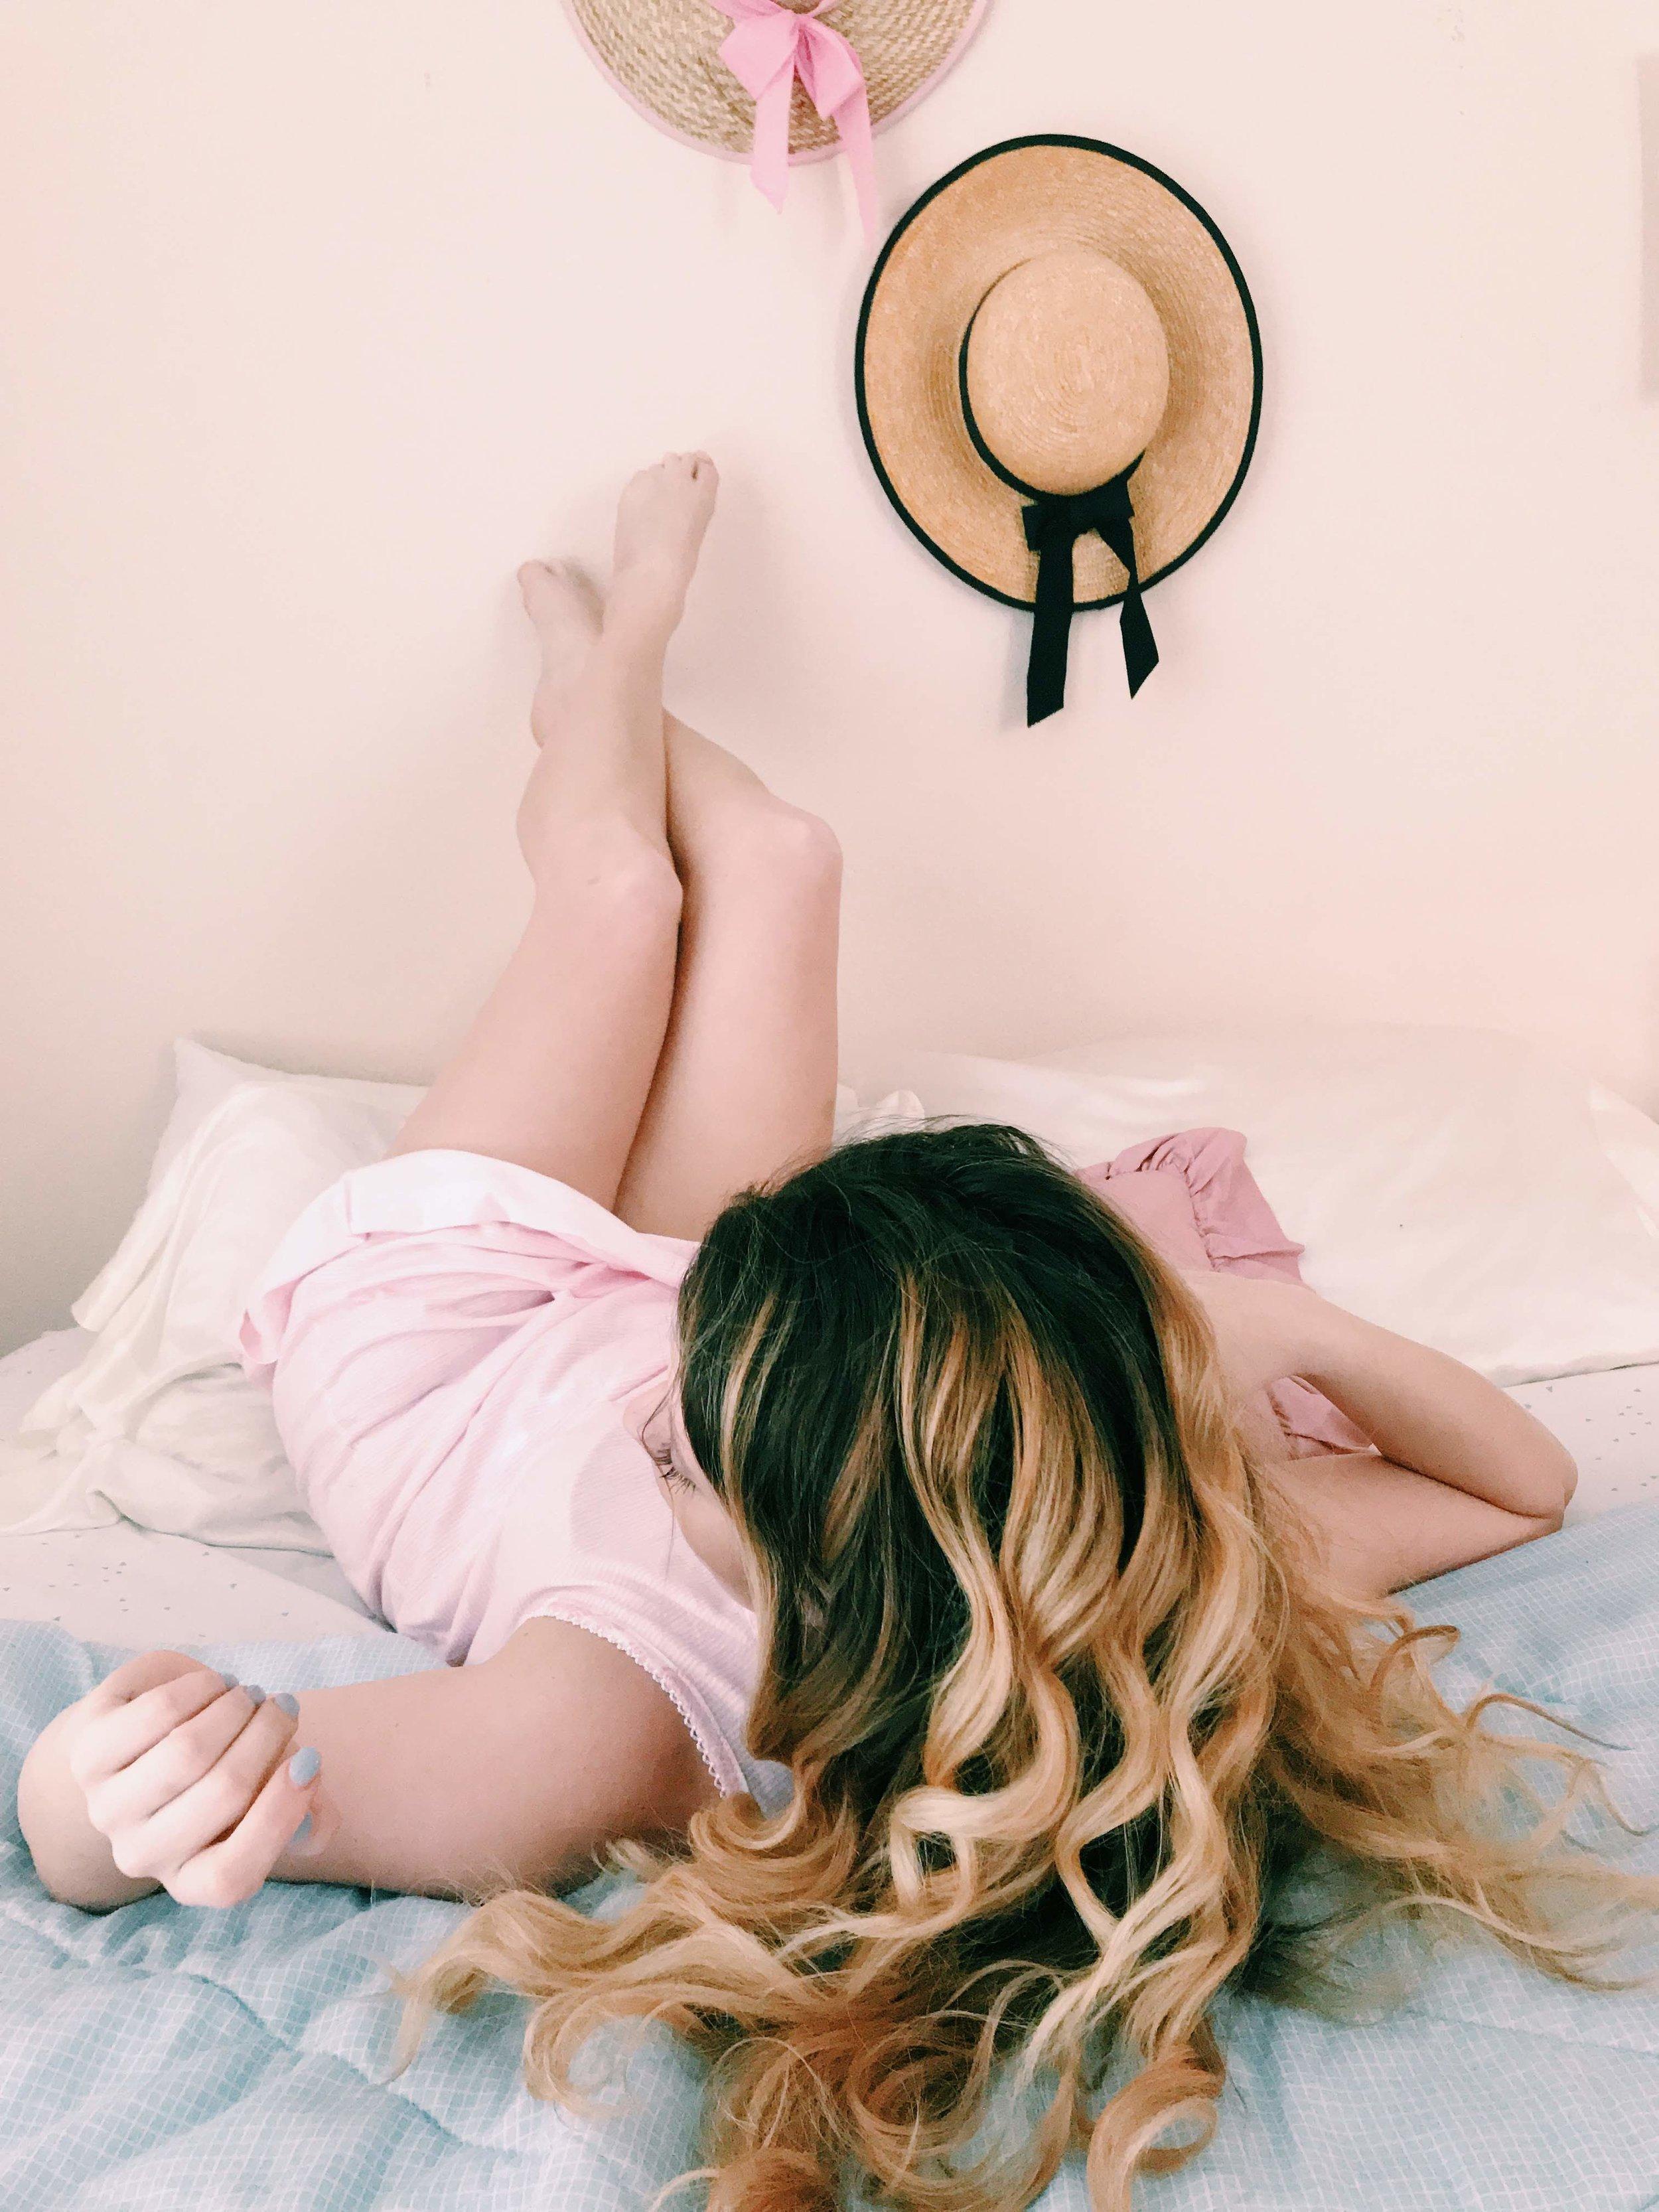 Three Heel Clicks - Create a Sleep Routine and Improve Anxiety (17).jpg